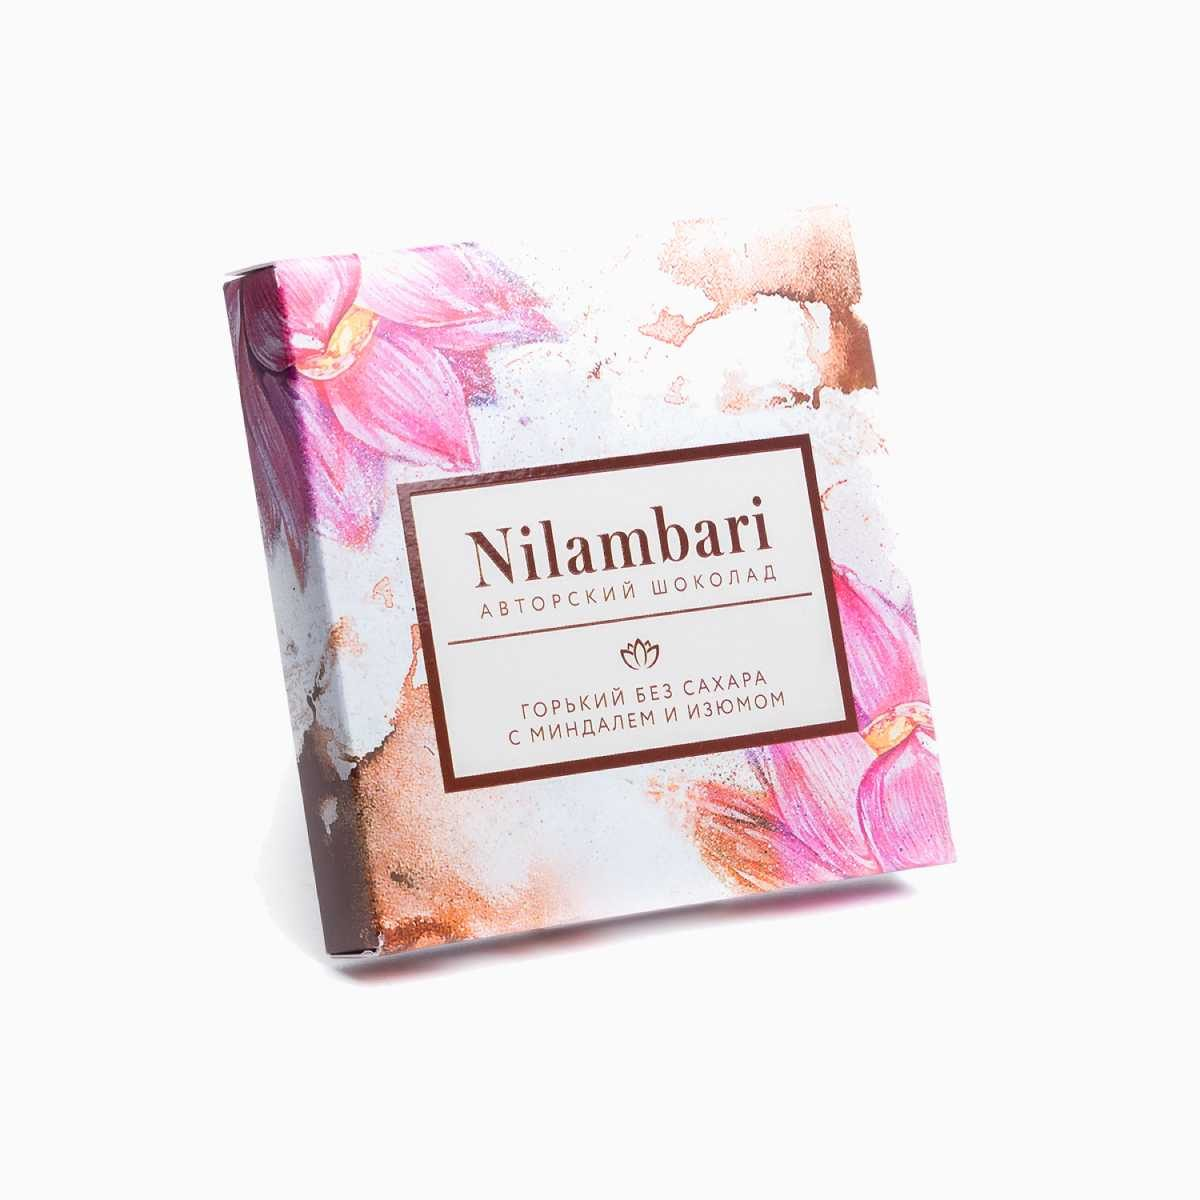 Шоколад горький с миндалем и изюмом, Nilambari, 65 г